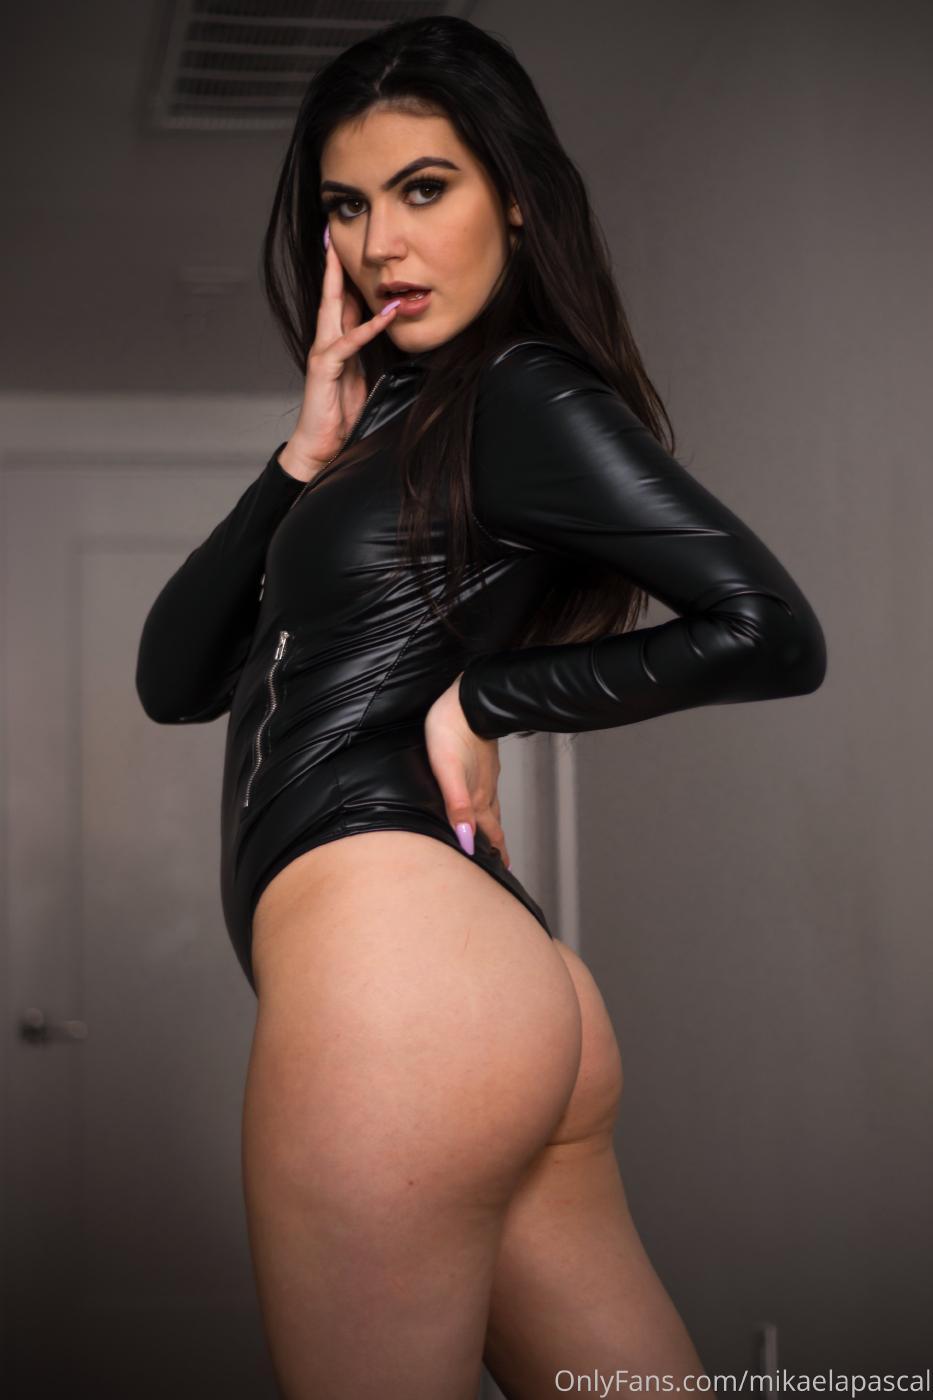 Mikaela Pascal Sexy Leather Bodysuit Onlyfans Set Leaked 0013